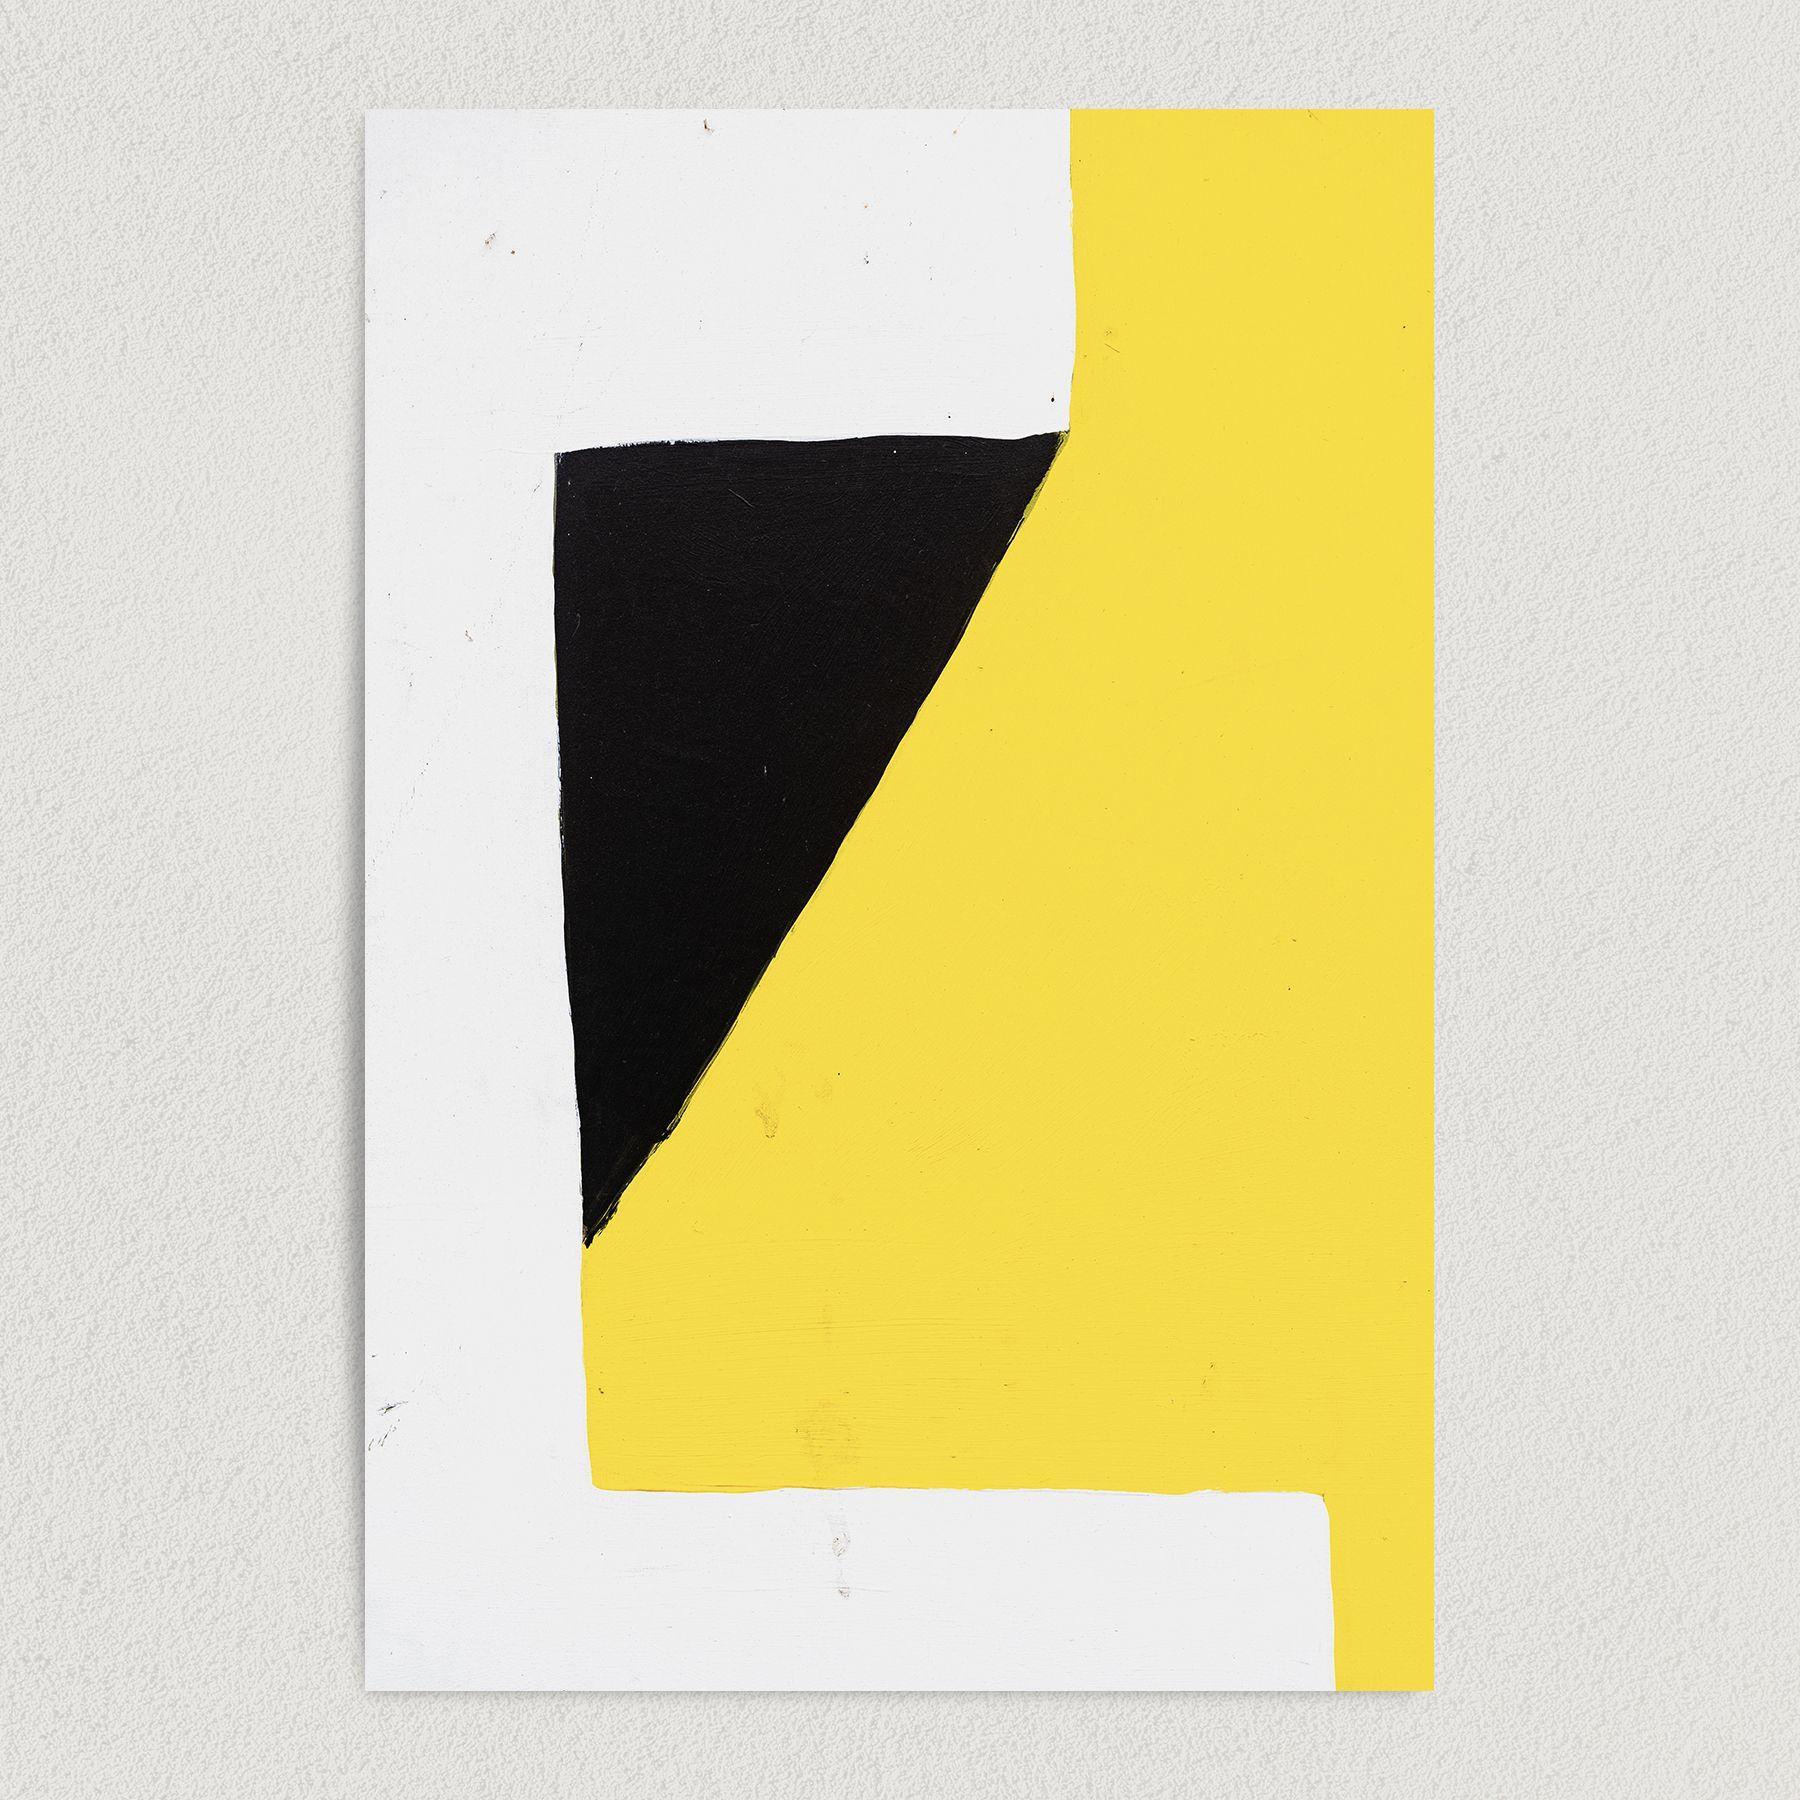 Abstract 3D Shape Art Print Poster A1007